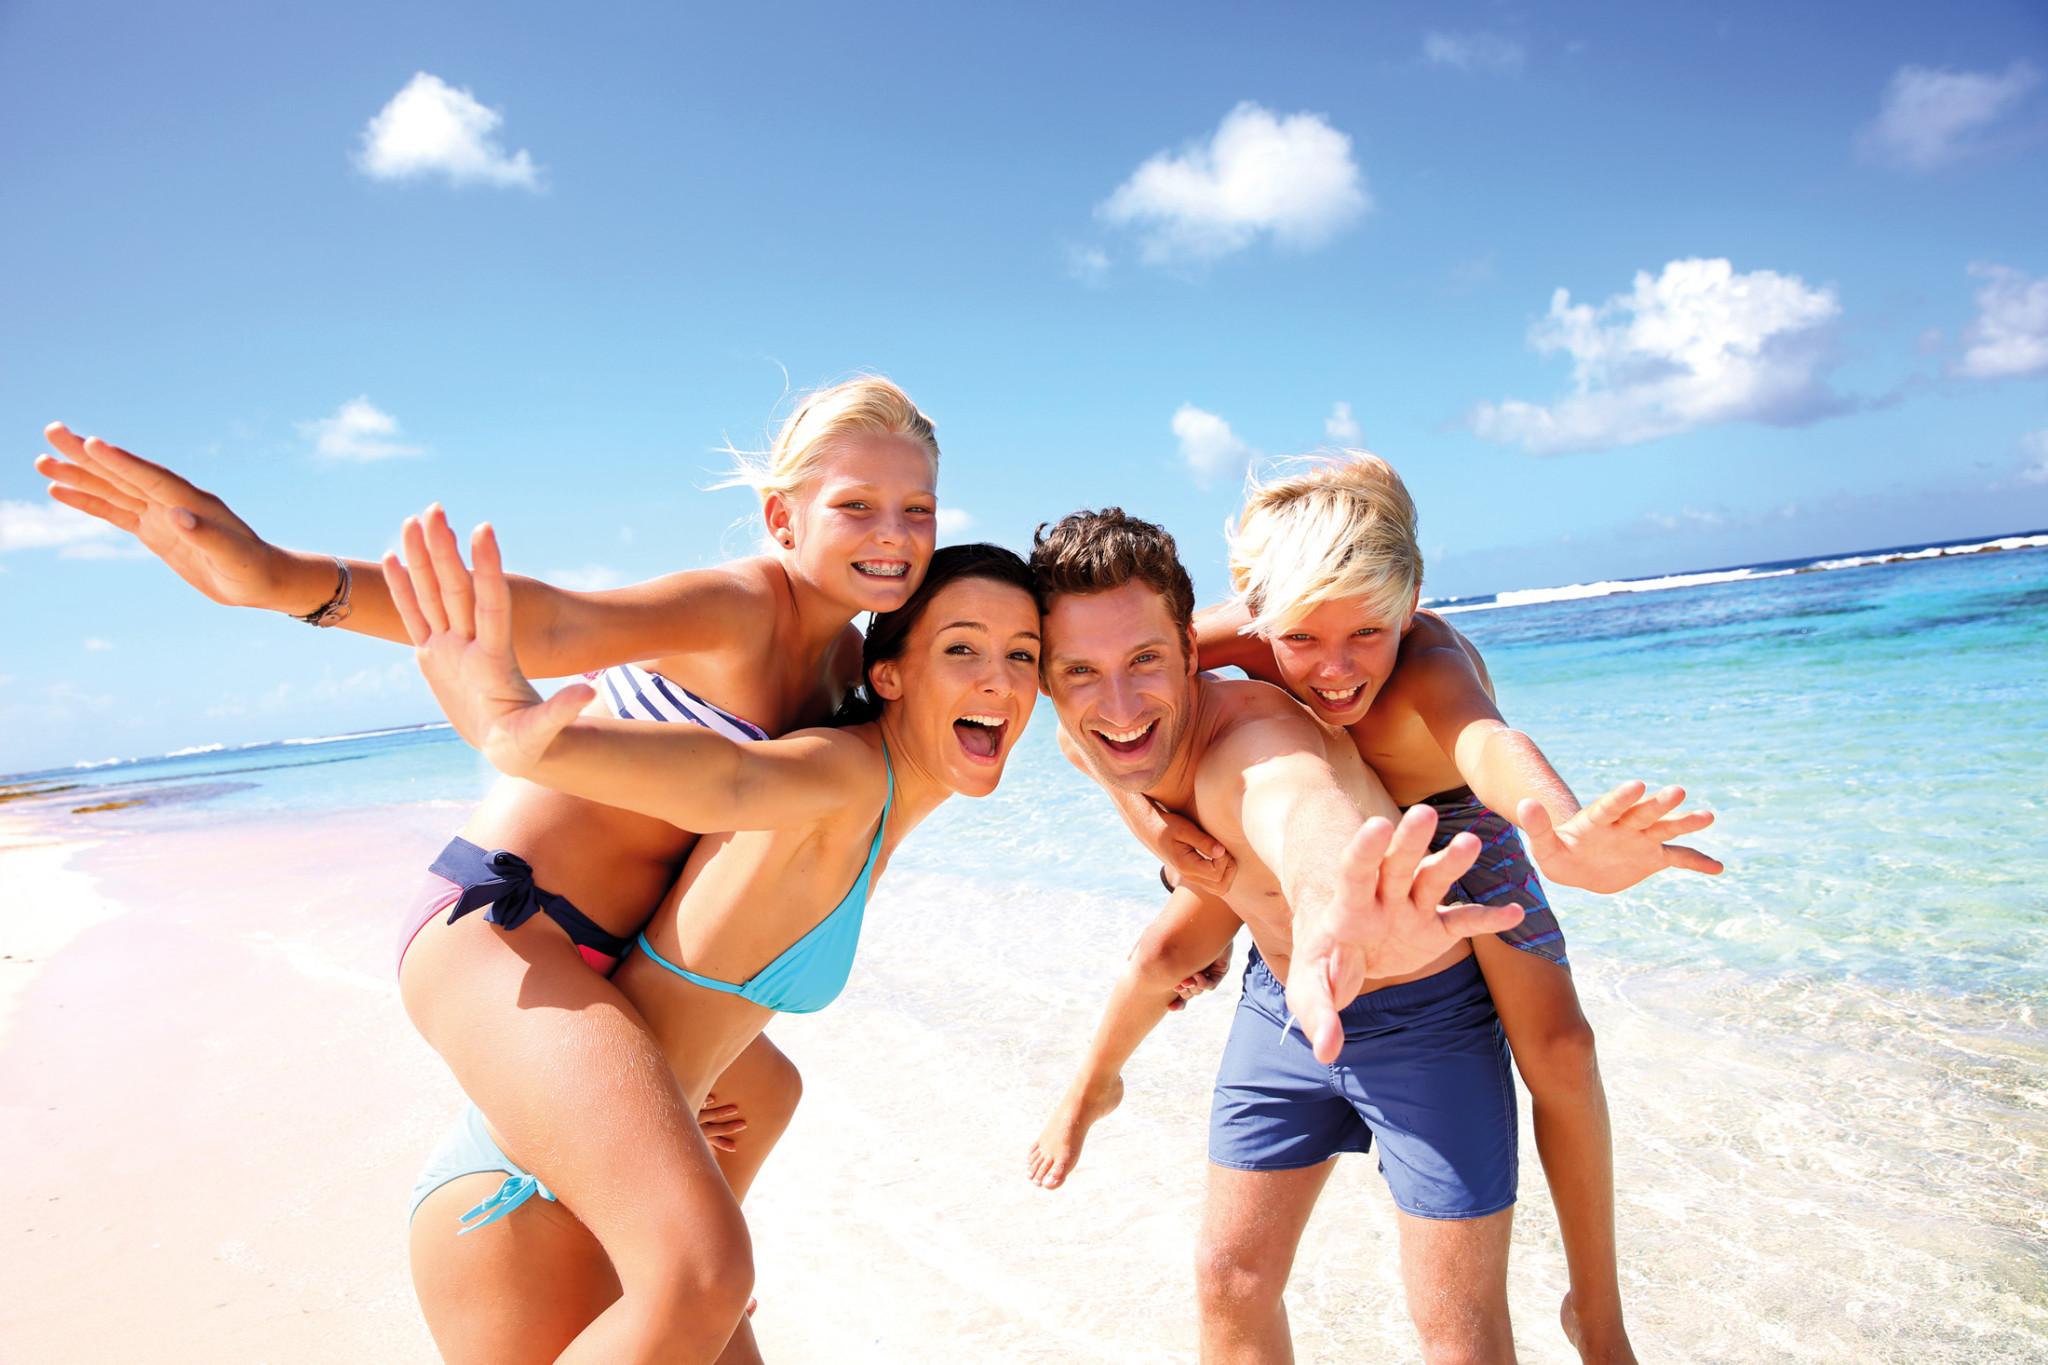 bigstock-family-of-four-having-fun-at-t-45299944